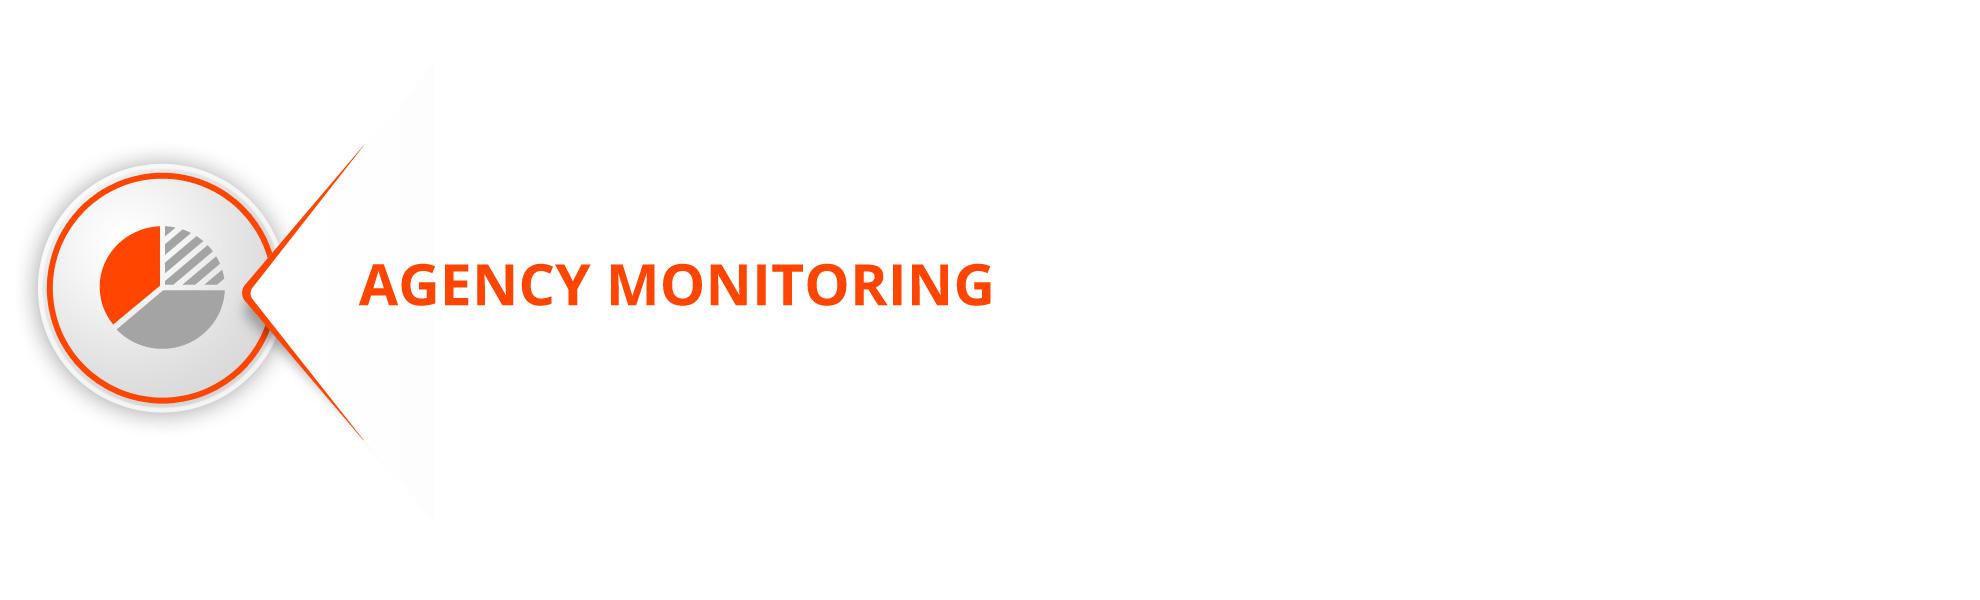 agency-monitoring